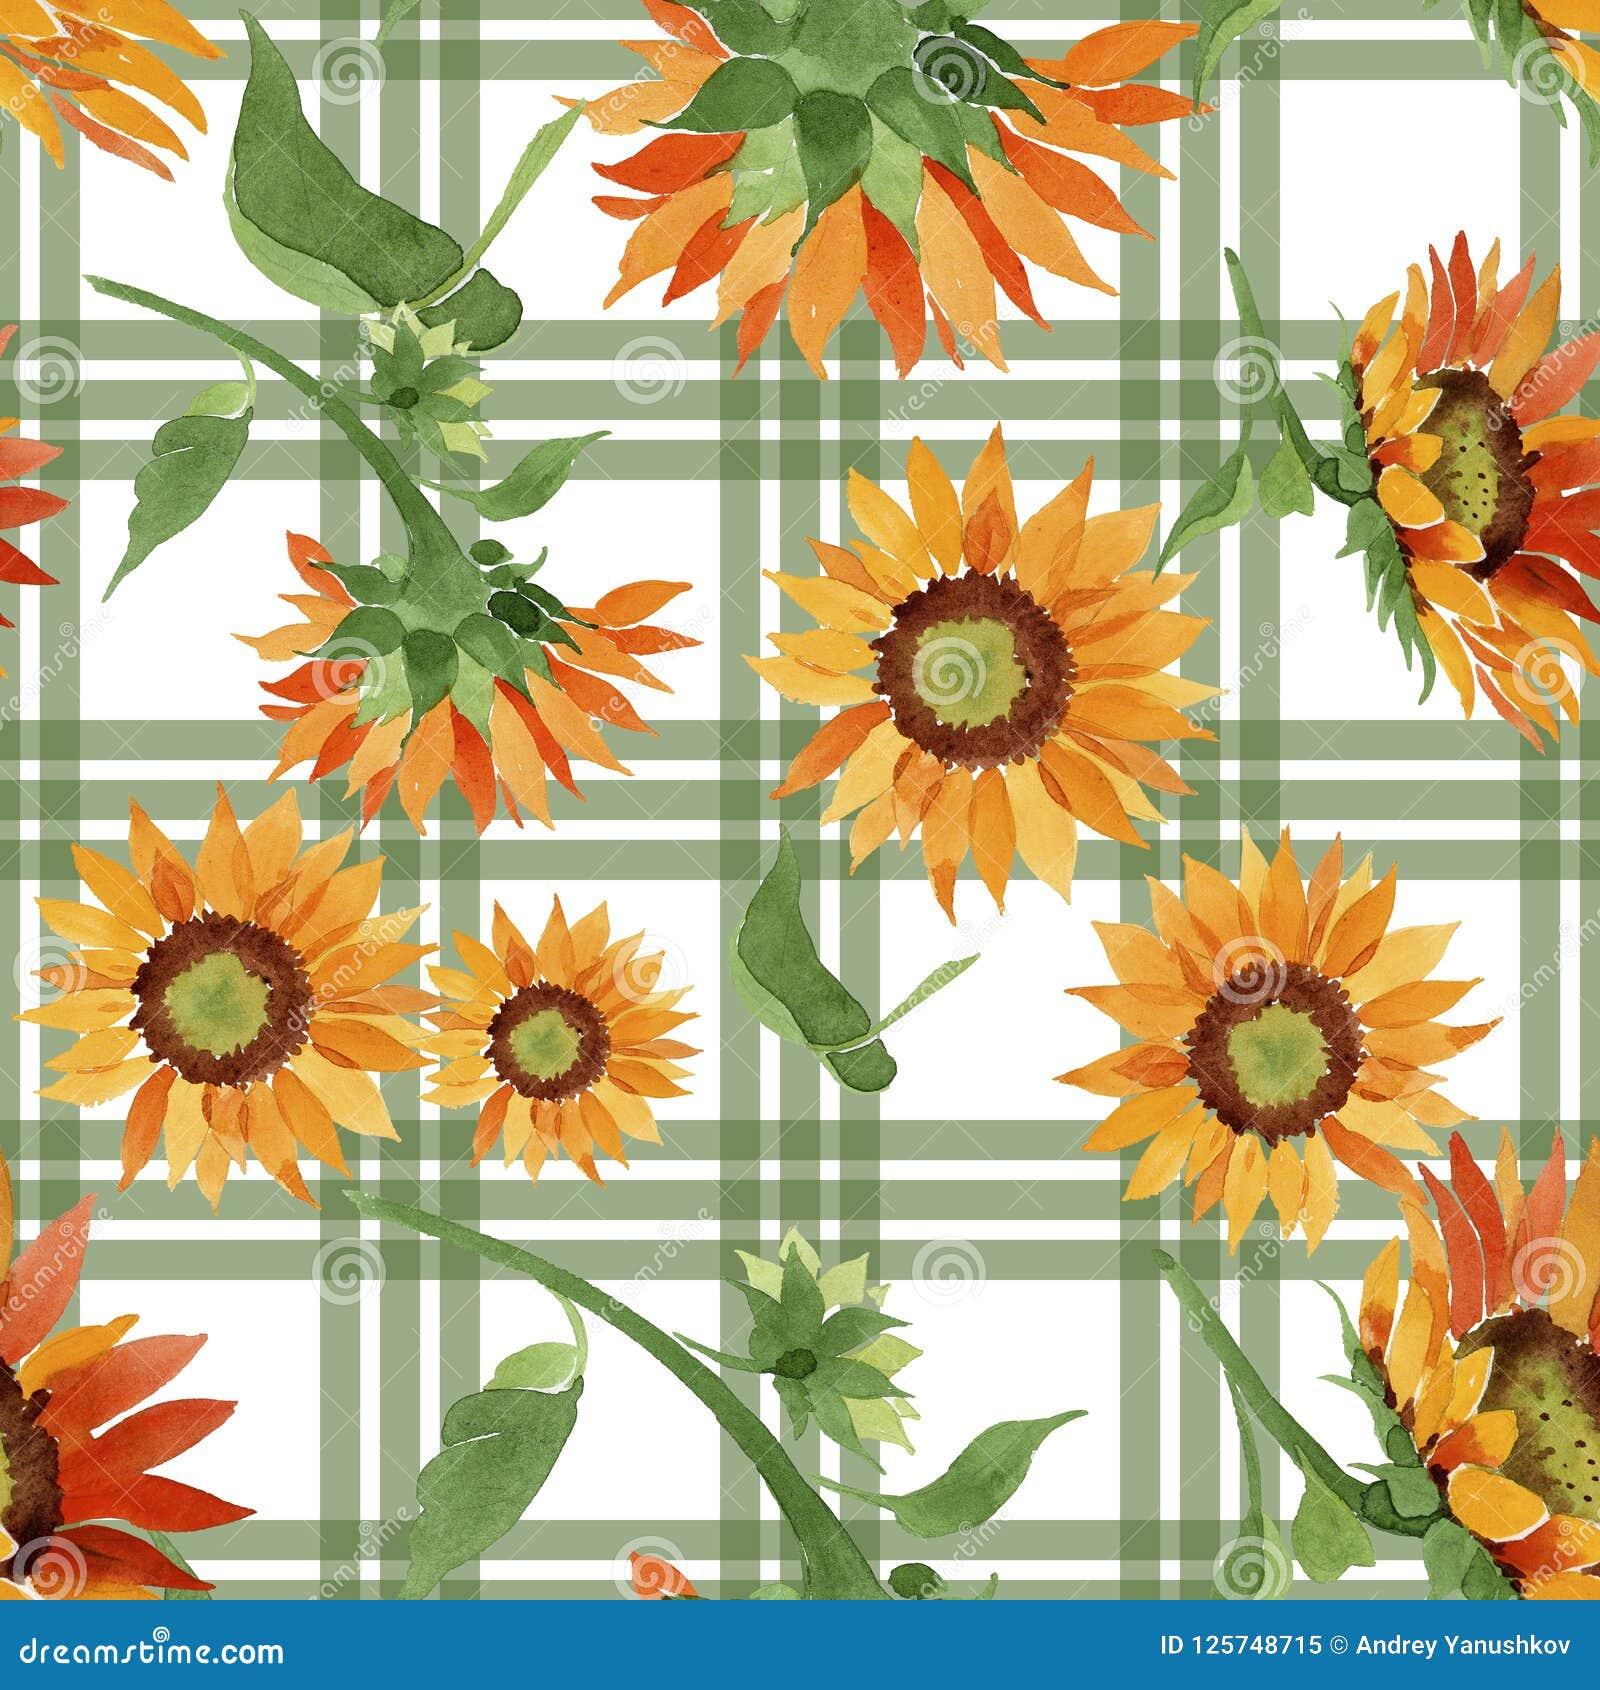 Download Watercolor Orange Sunflower Flower Floral Botanical Seamless Background Pattern Stock Illustration